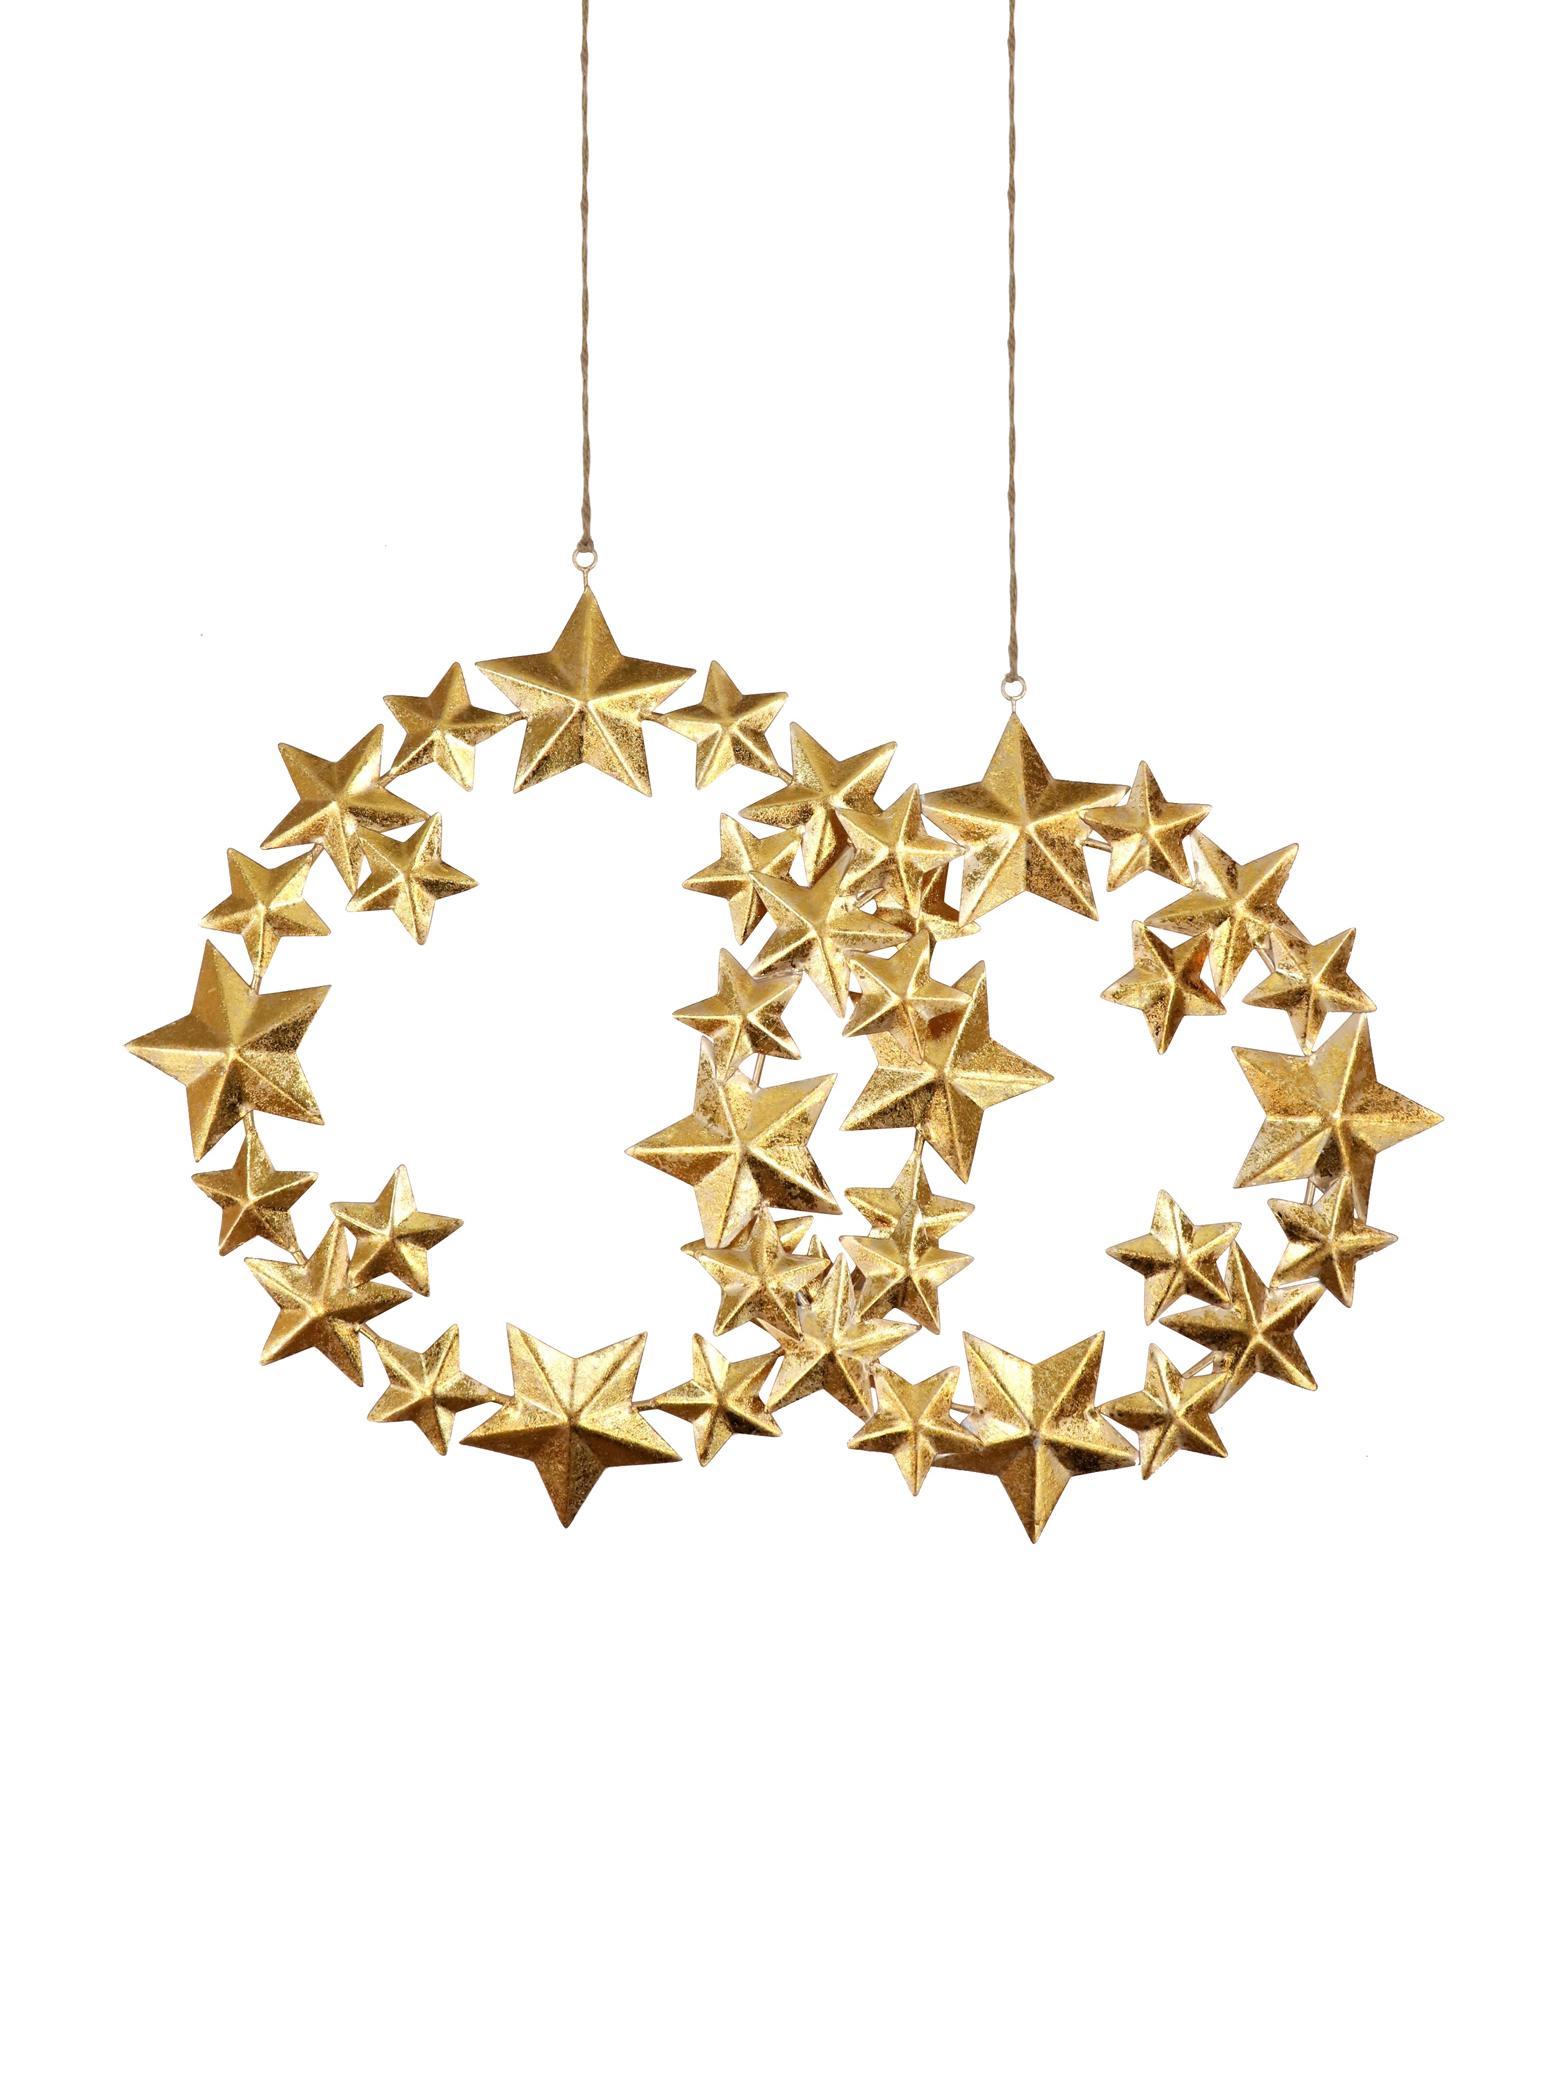 Set de adornos navideños Stars, 2pzas., Metal, recubierto, Dorado, Set de diferentes tamaños